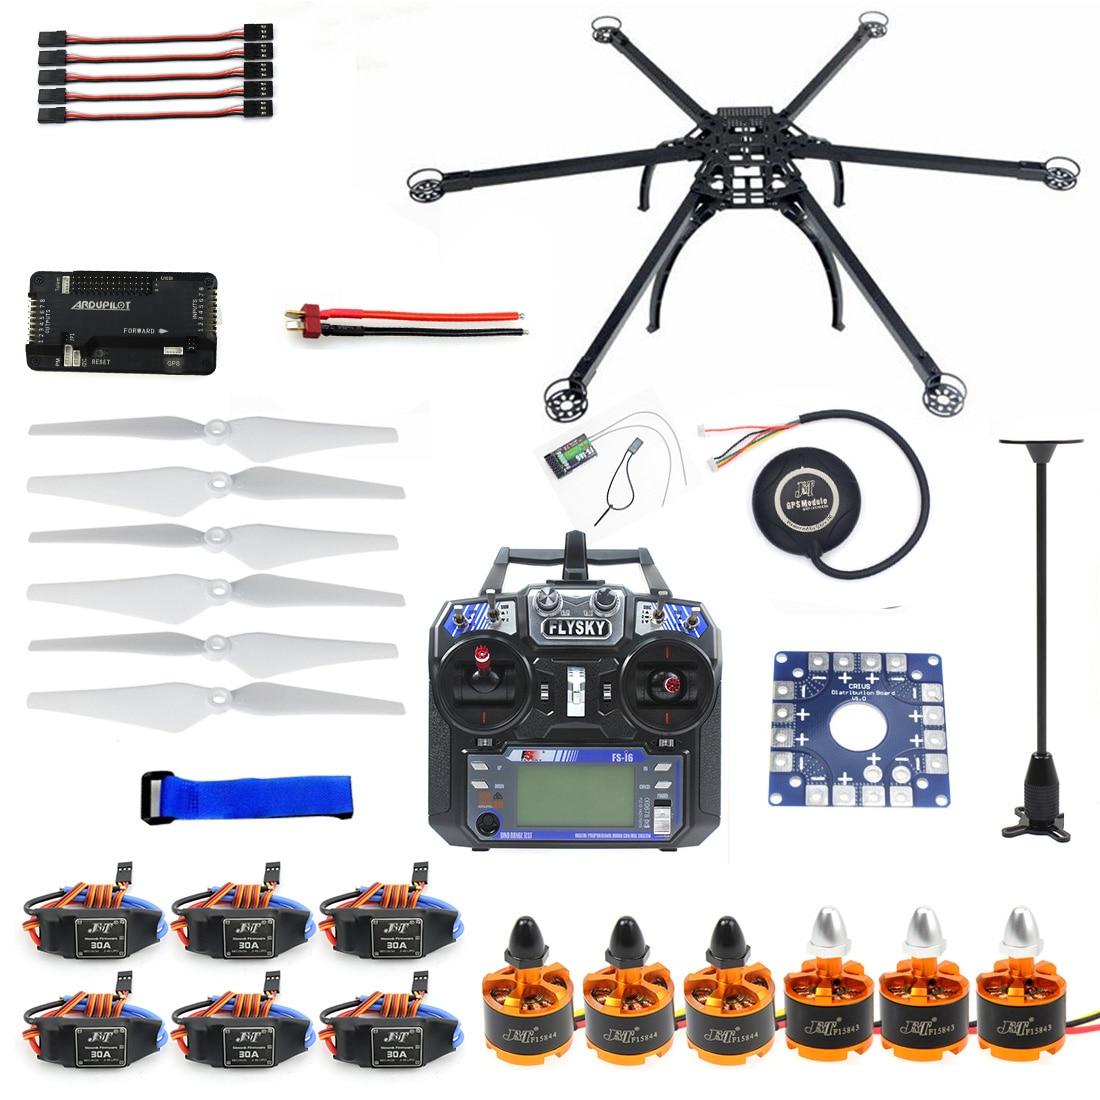 Six-essieu Hexacopter Unassembled GPS Drone Kit avec Flysky FS-i6 6CH 2.4g TX et RX APM 2.8 Multicopter contrôleur de vol F10513-F